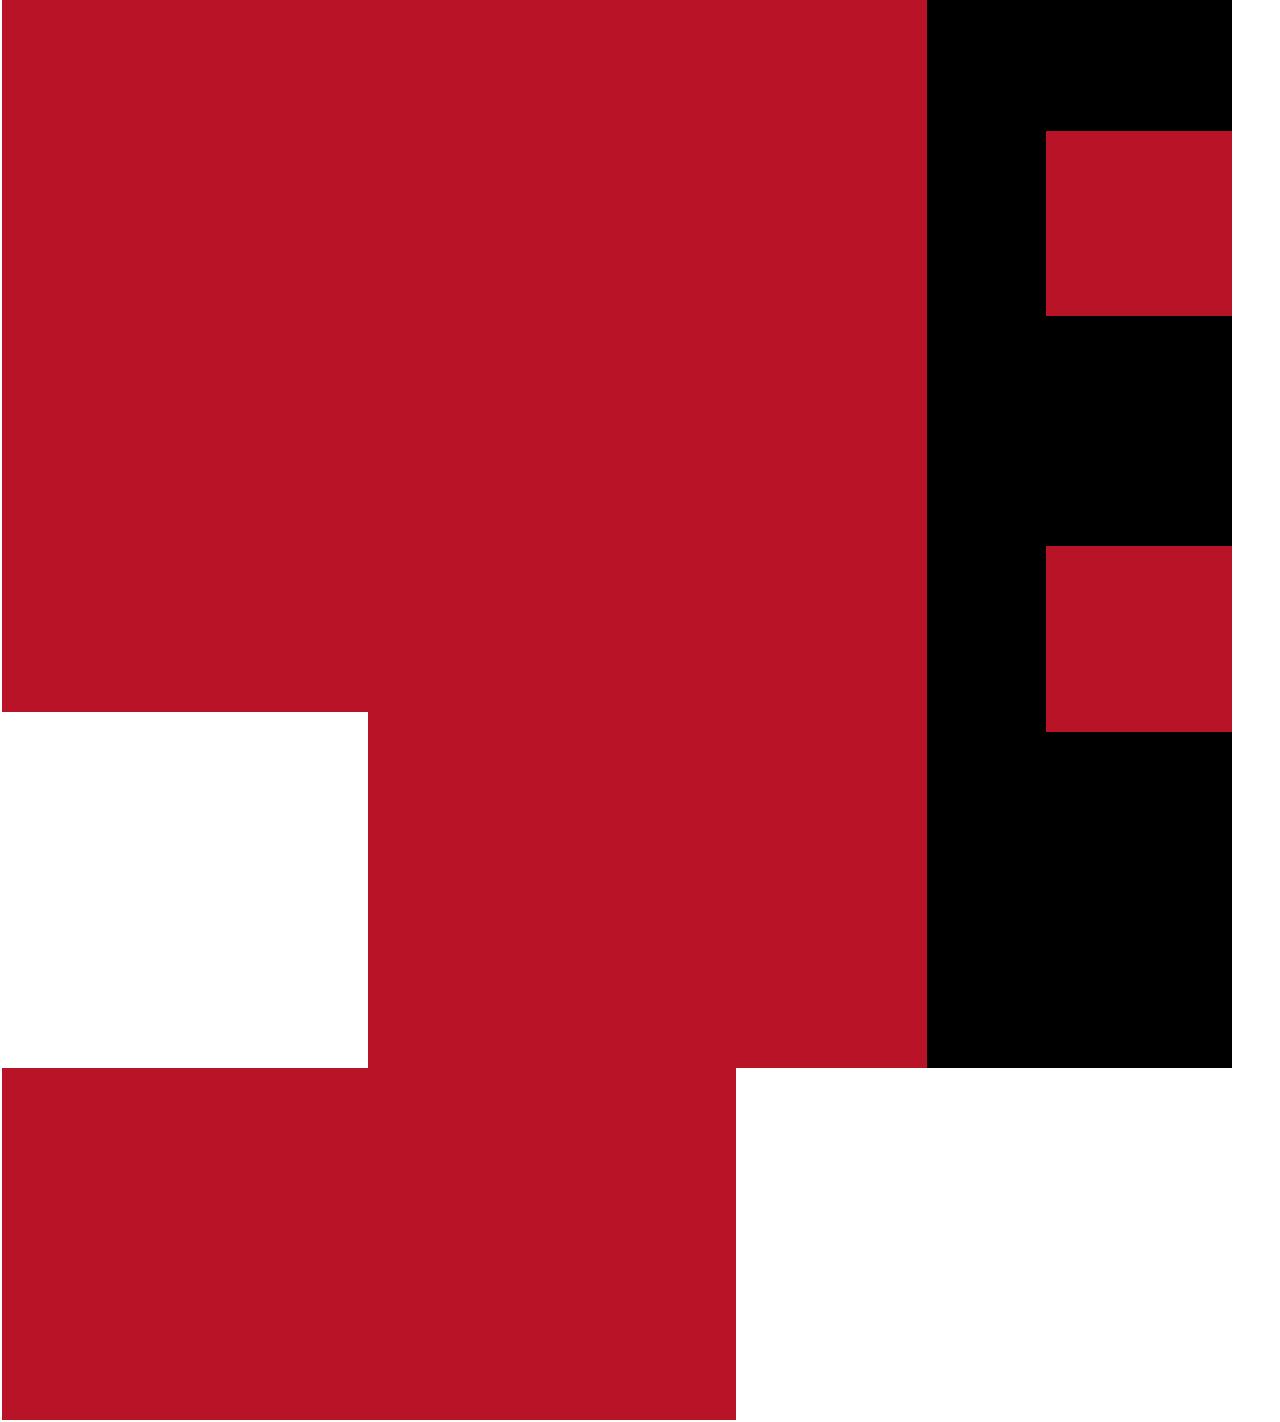 Bass clef in dark red.